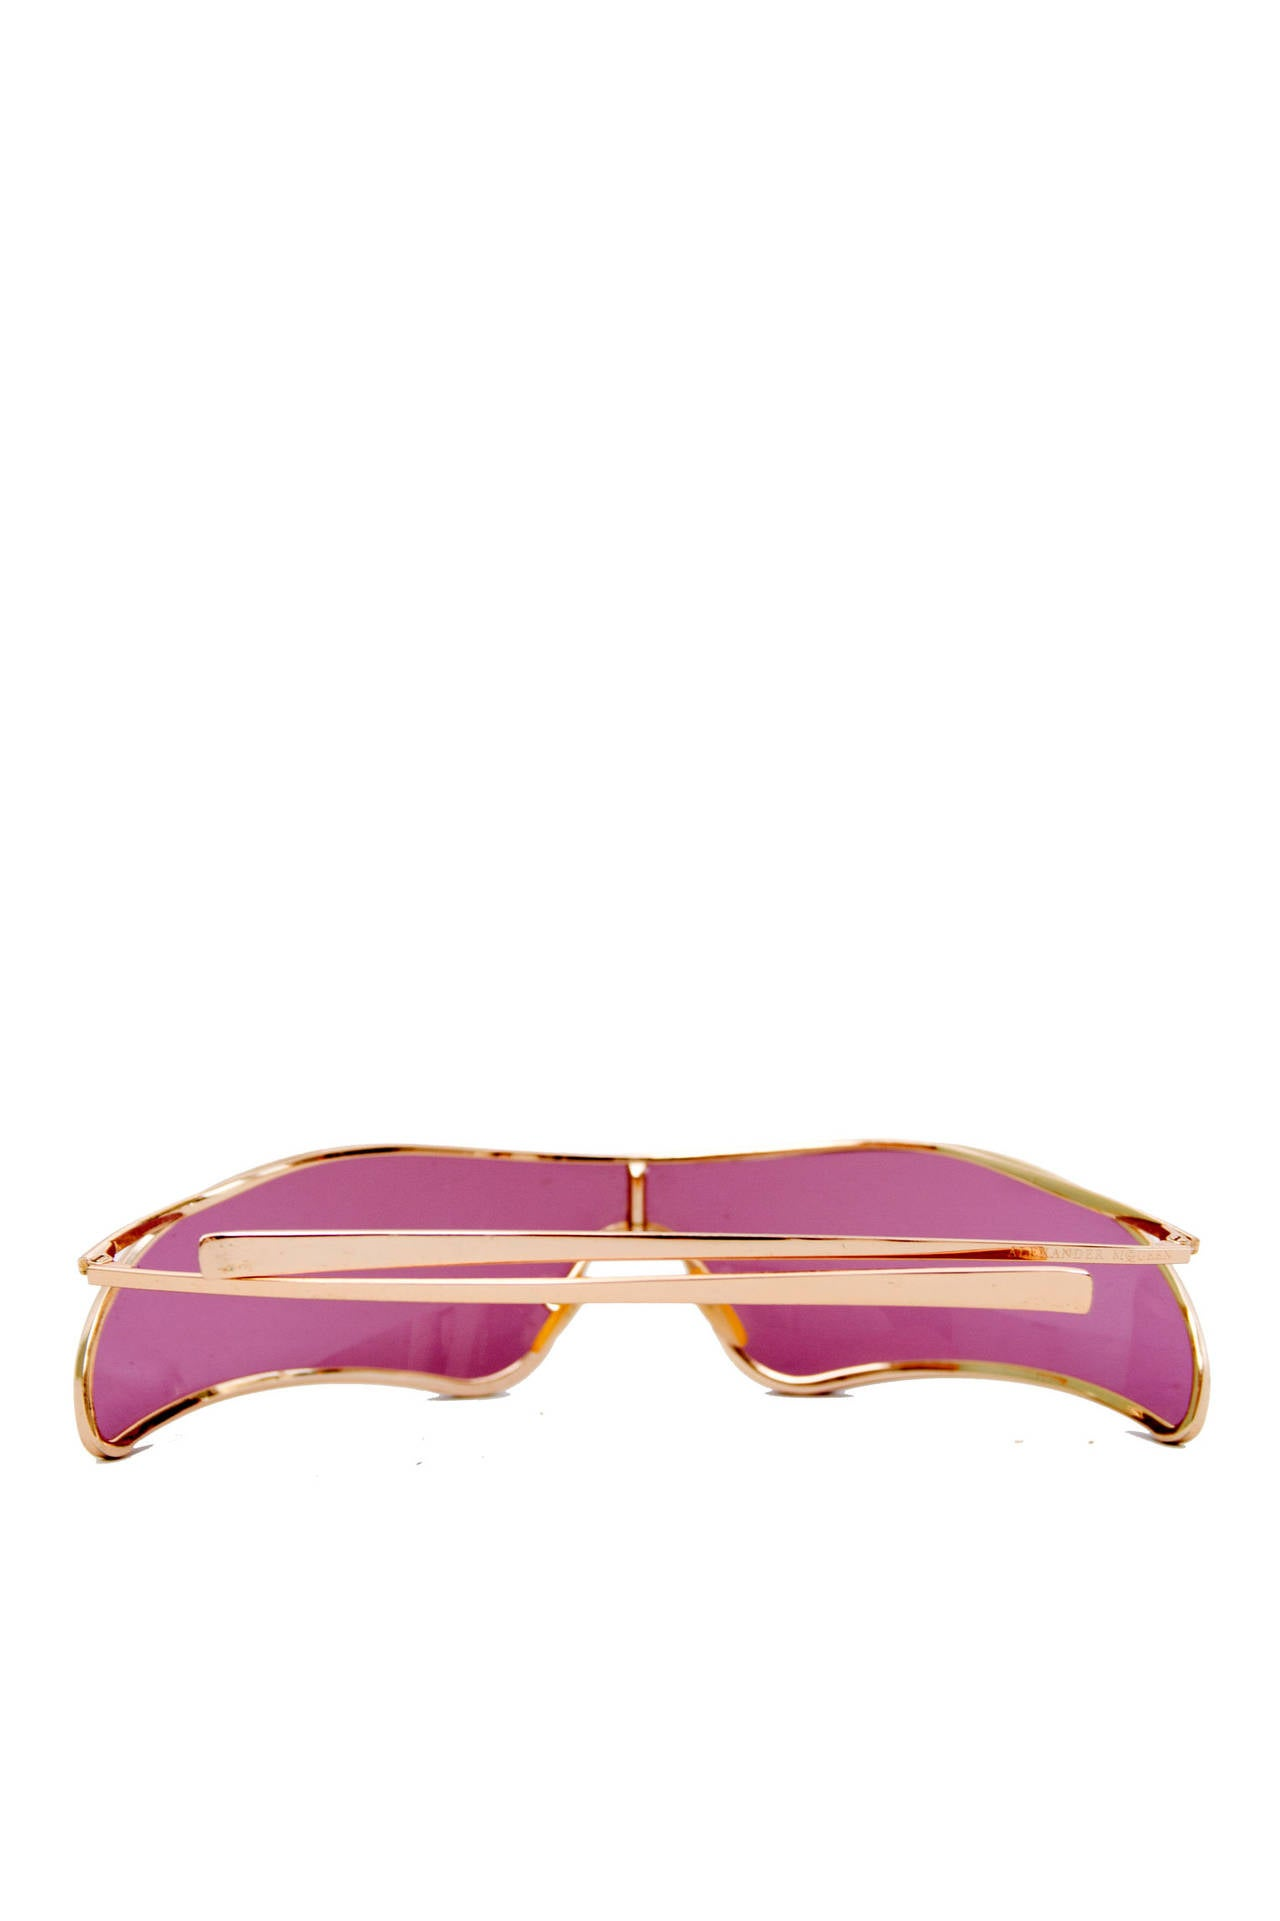 Women's Rare Alexander McQueen Sunglasses For Sale